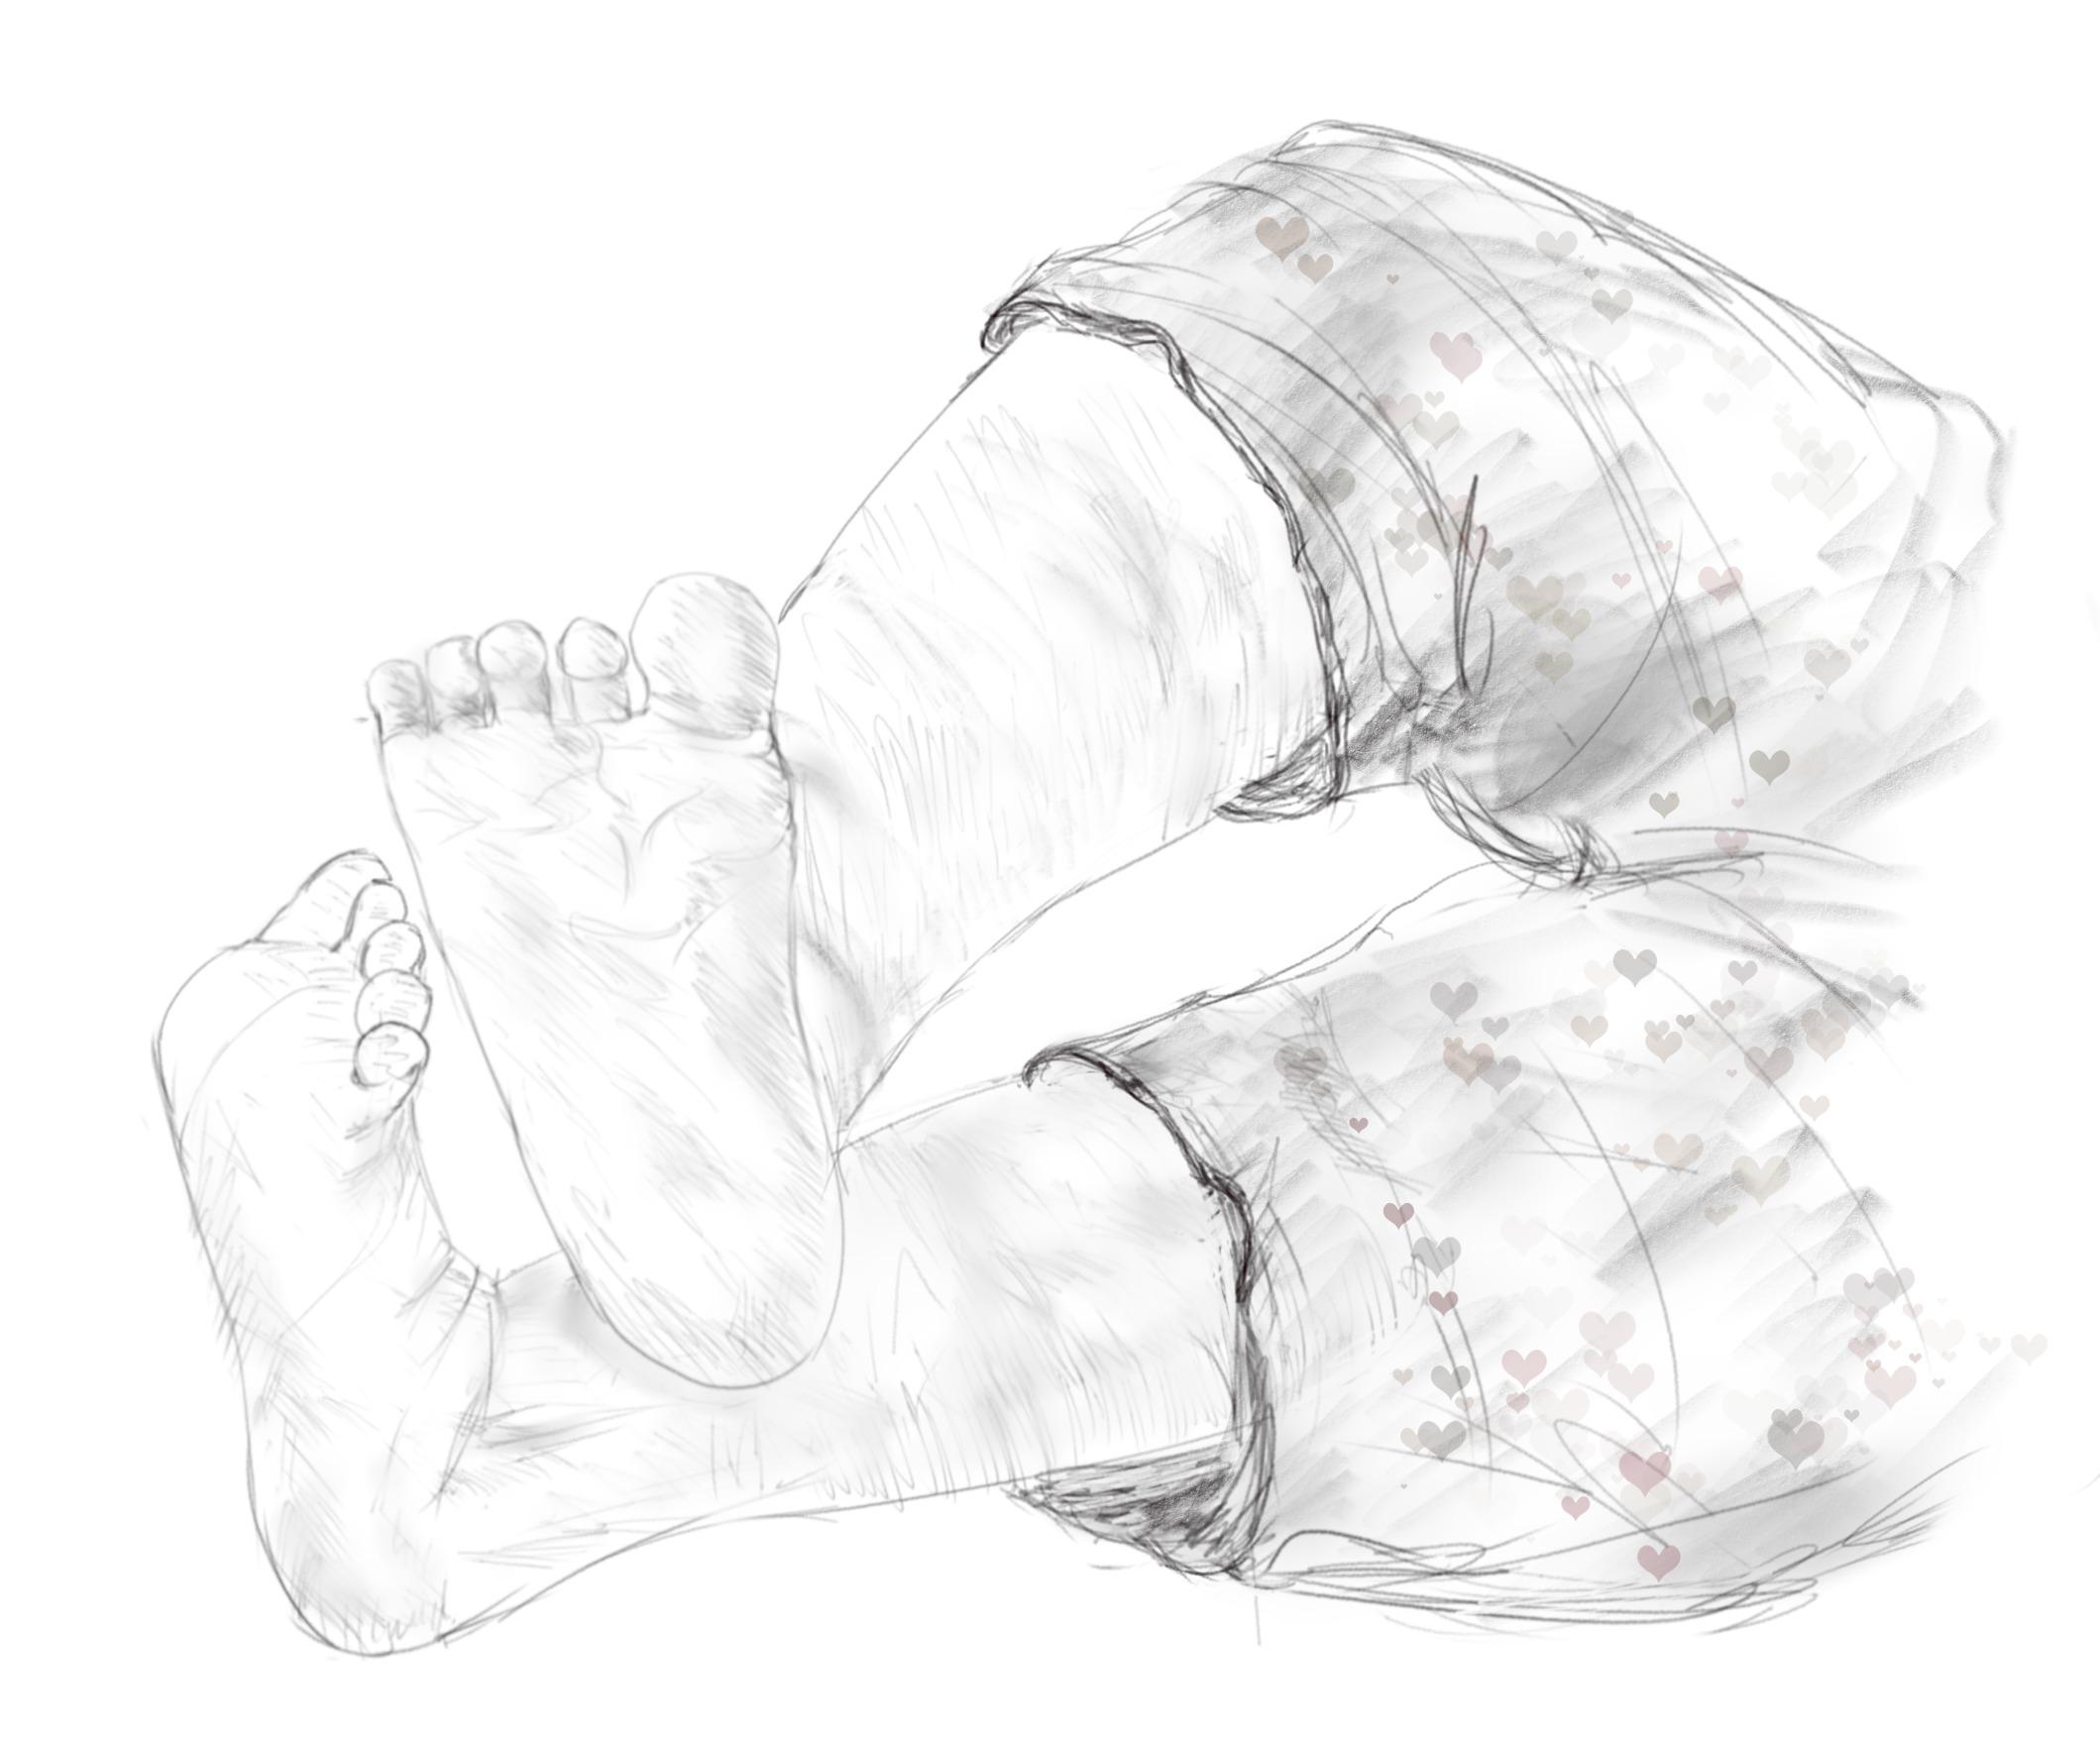 Supernaturo-pied bebe